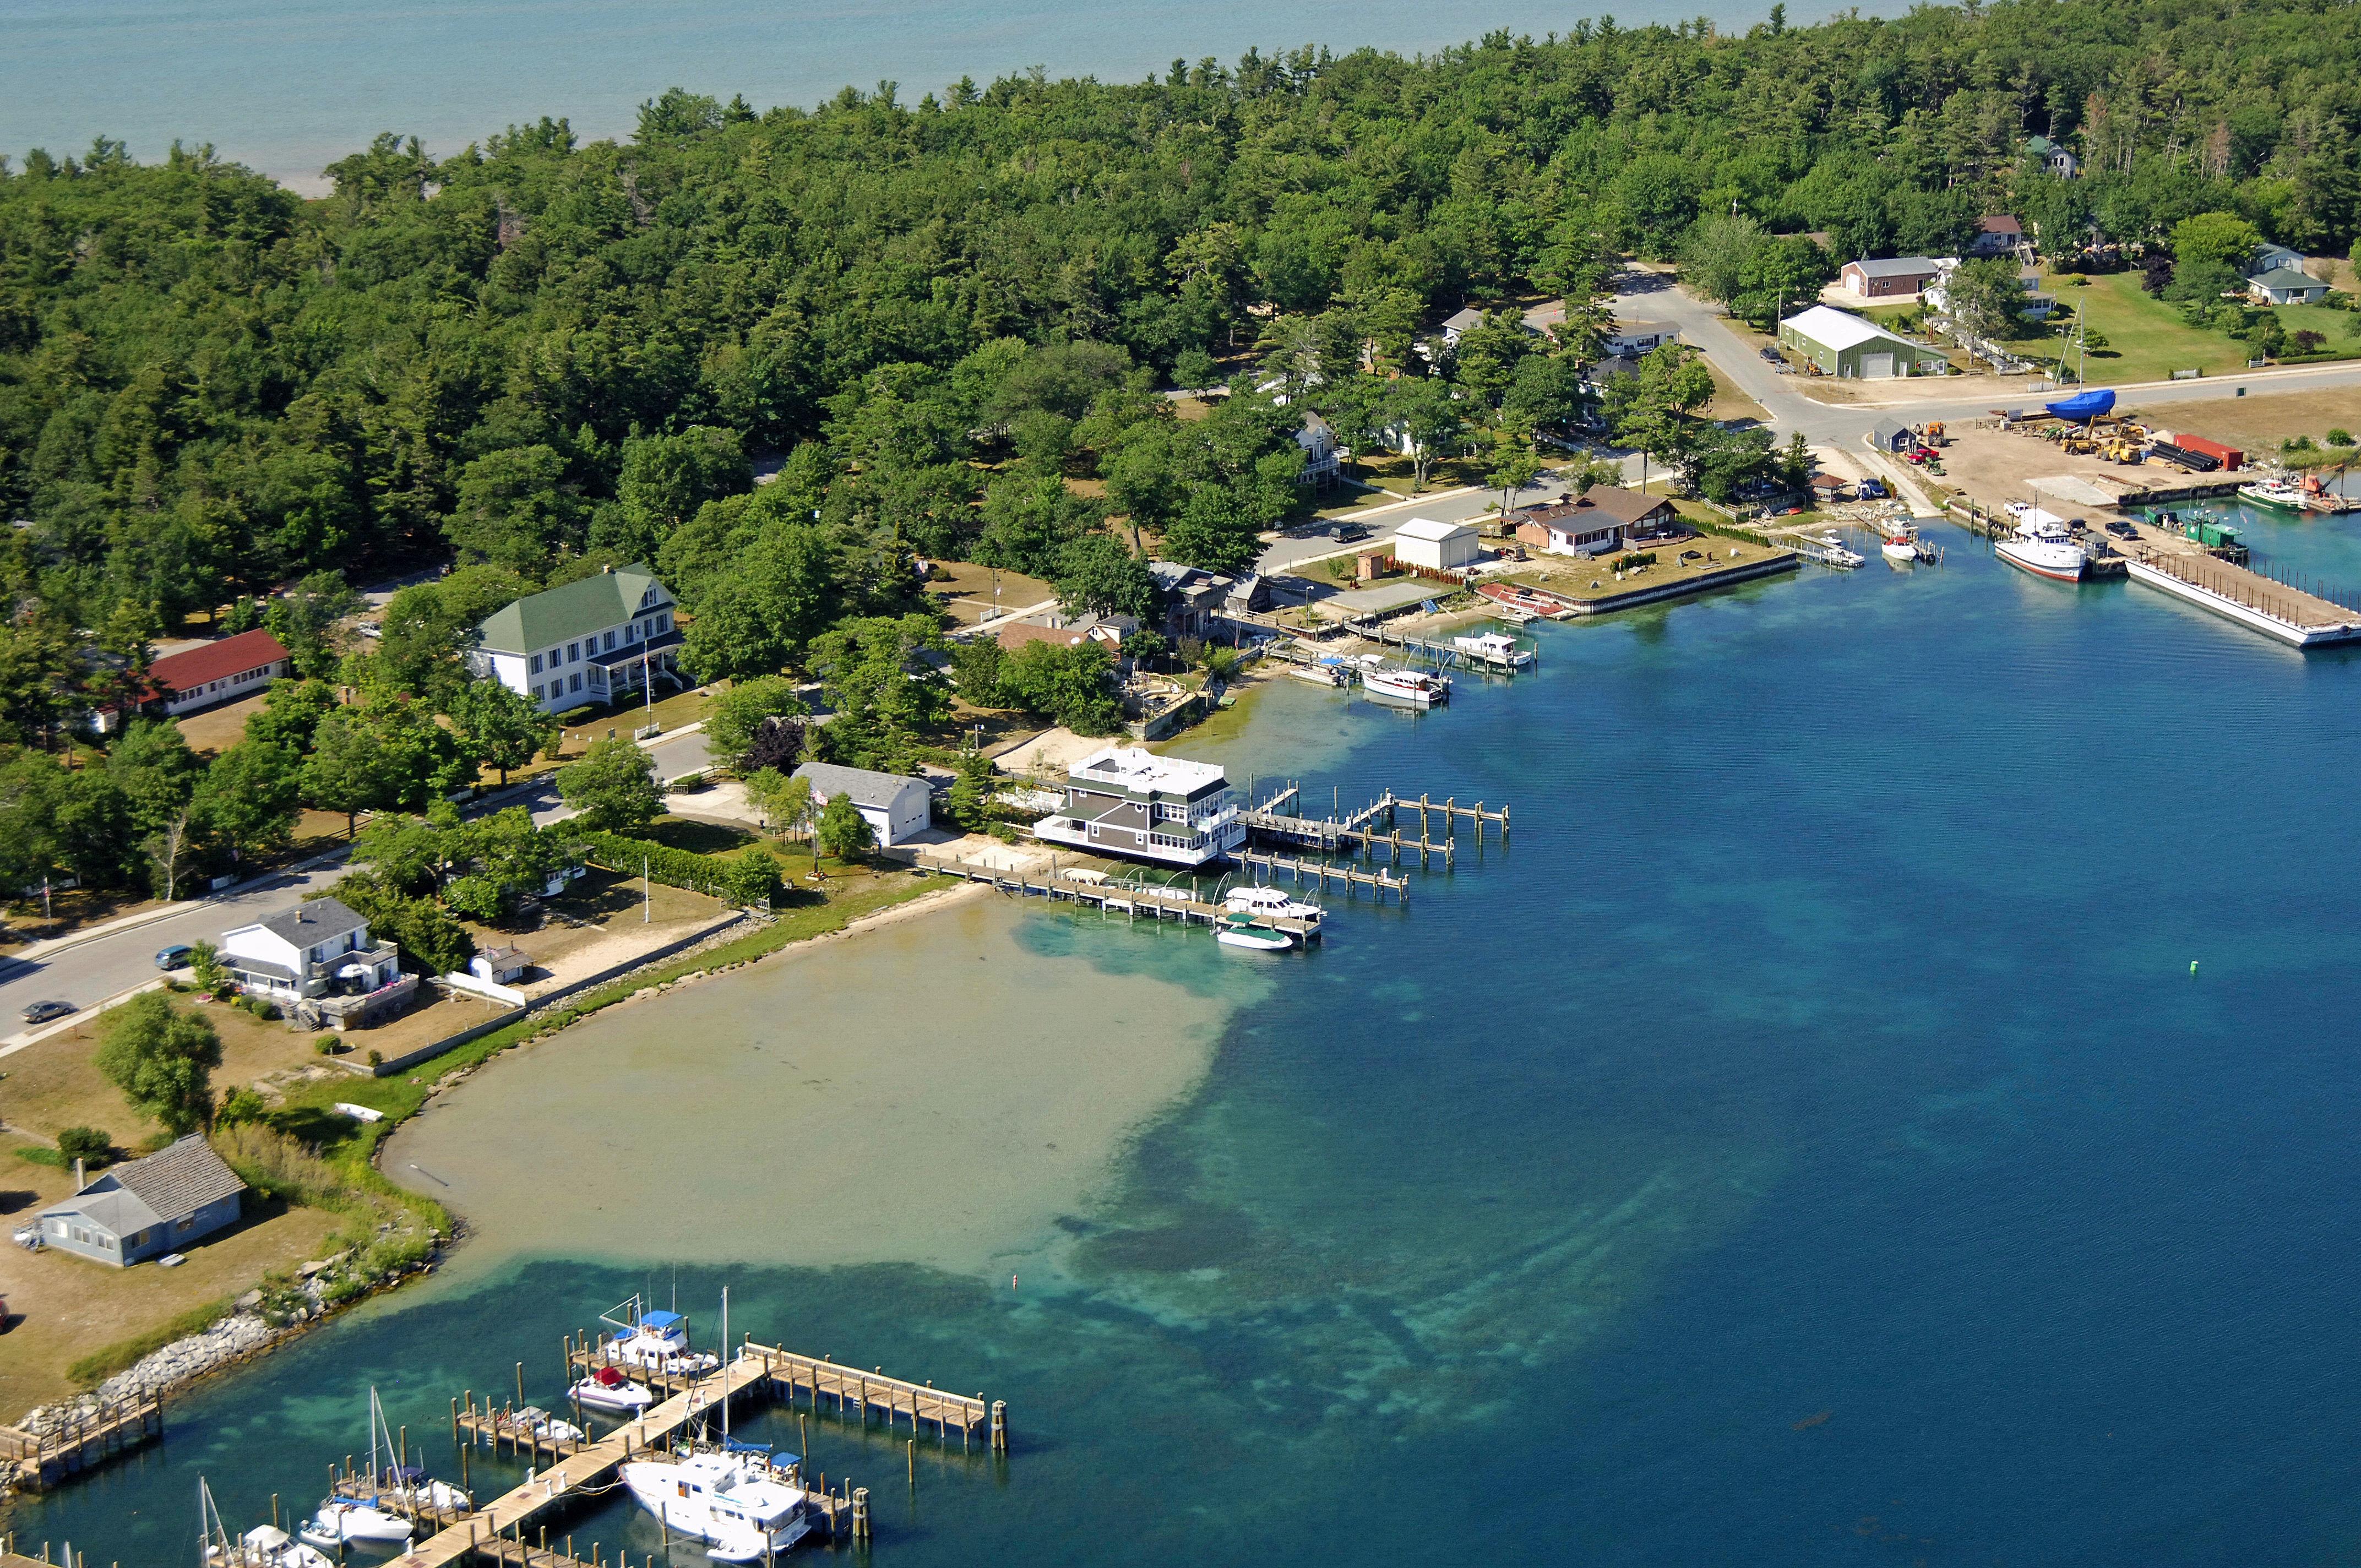 King Strang Hotel Beaver Island